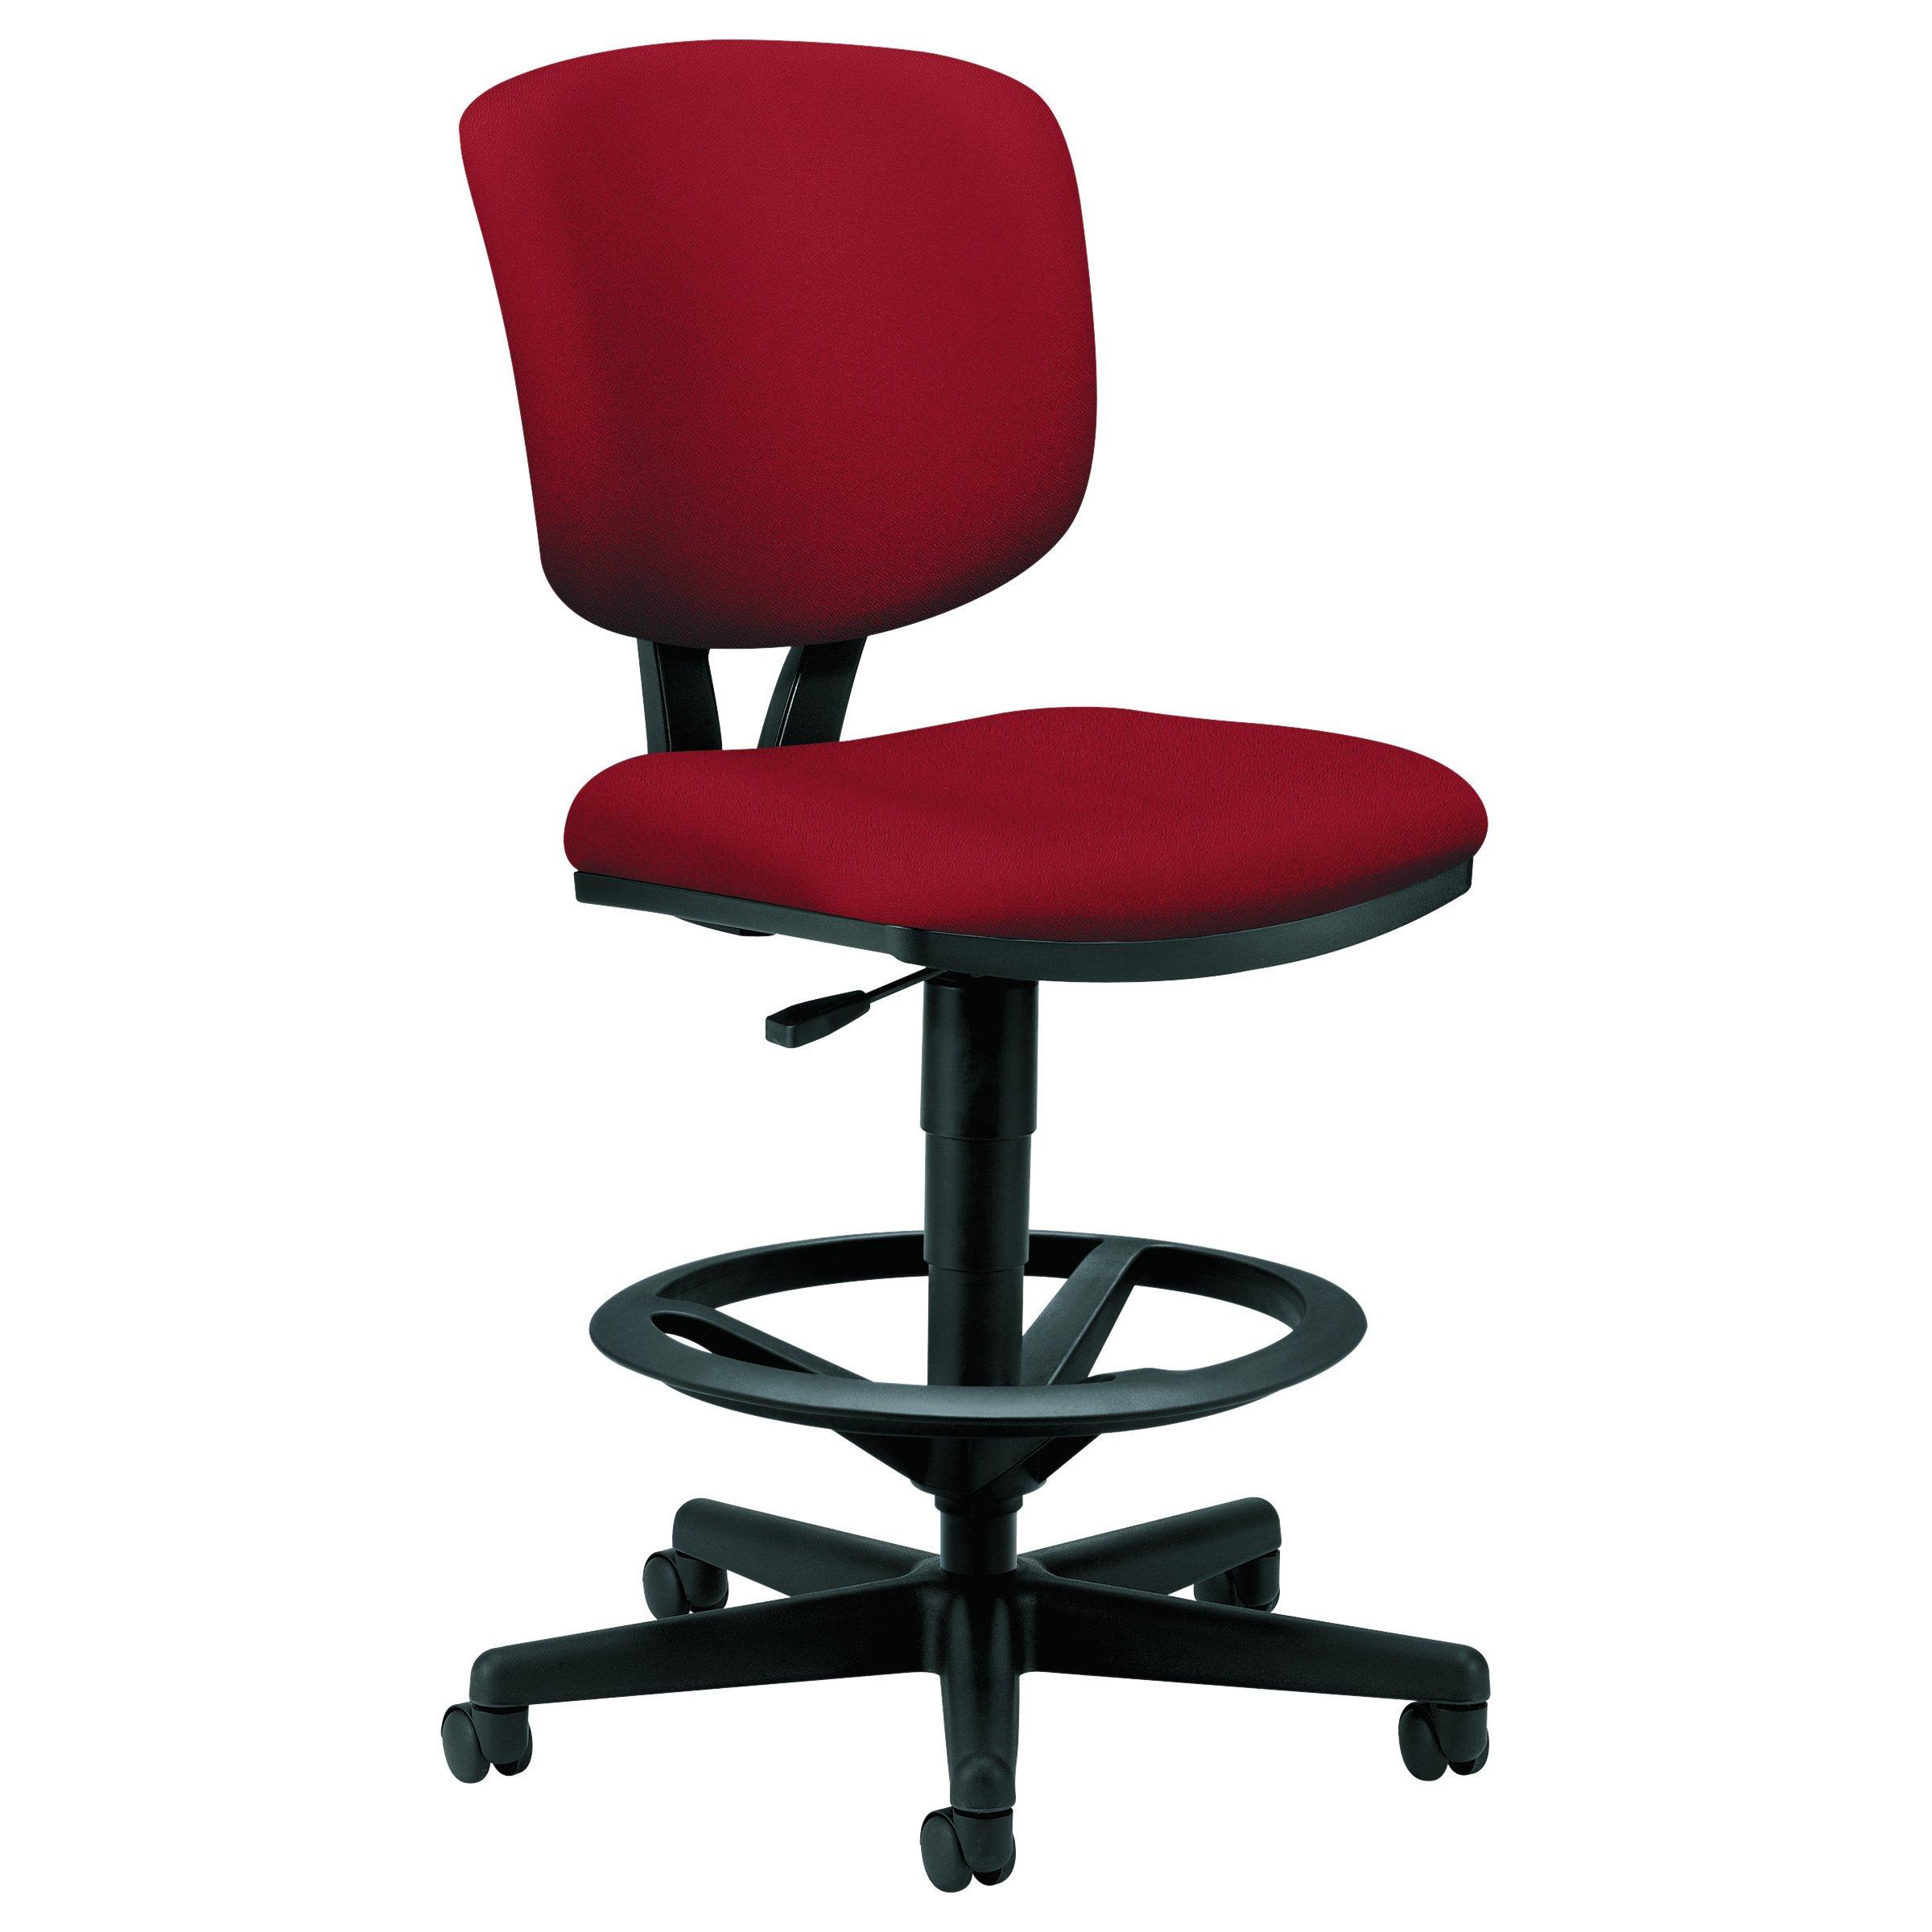 HON Volt Task Stool - Upholstered Adjustable Office Stool, Crimson (H5705) by HON